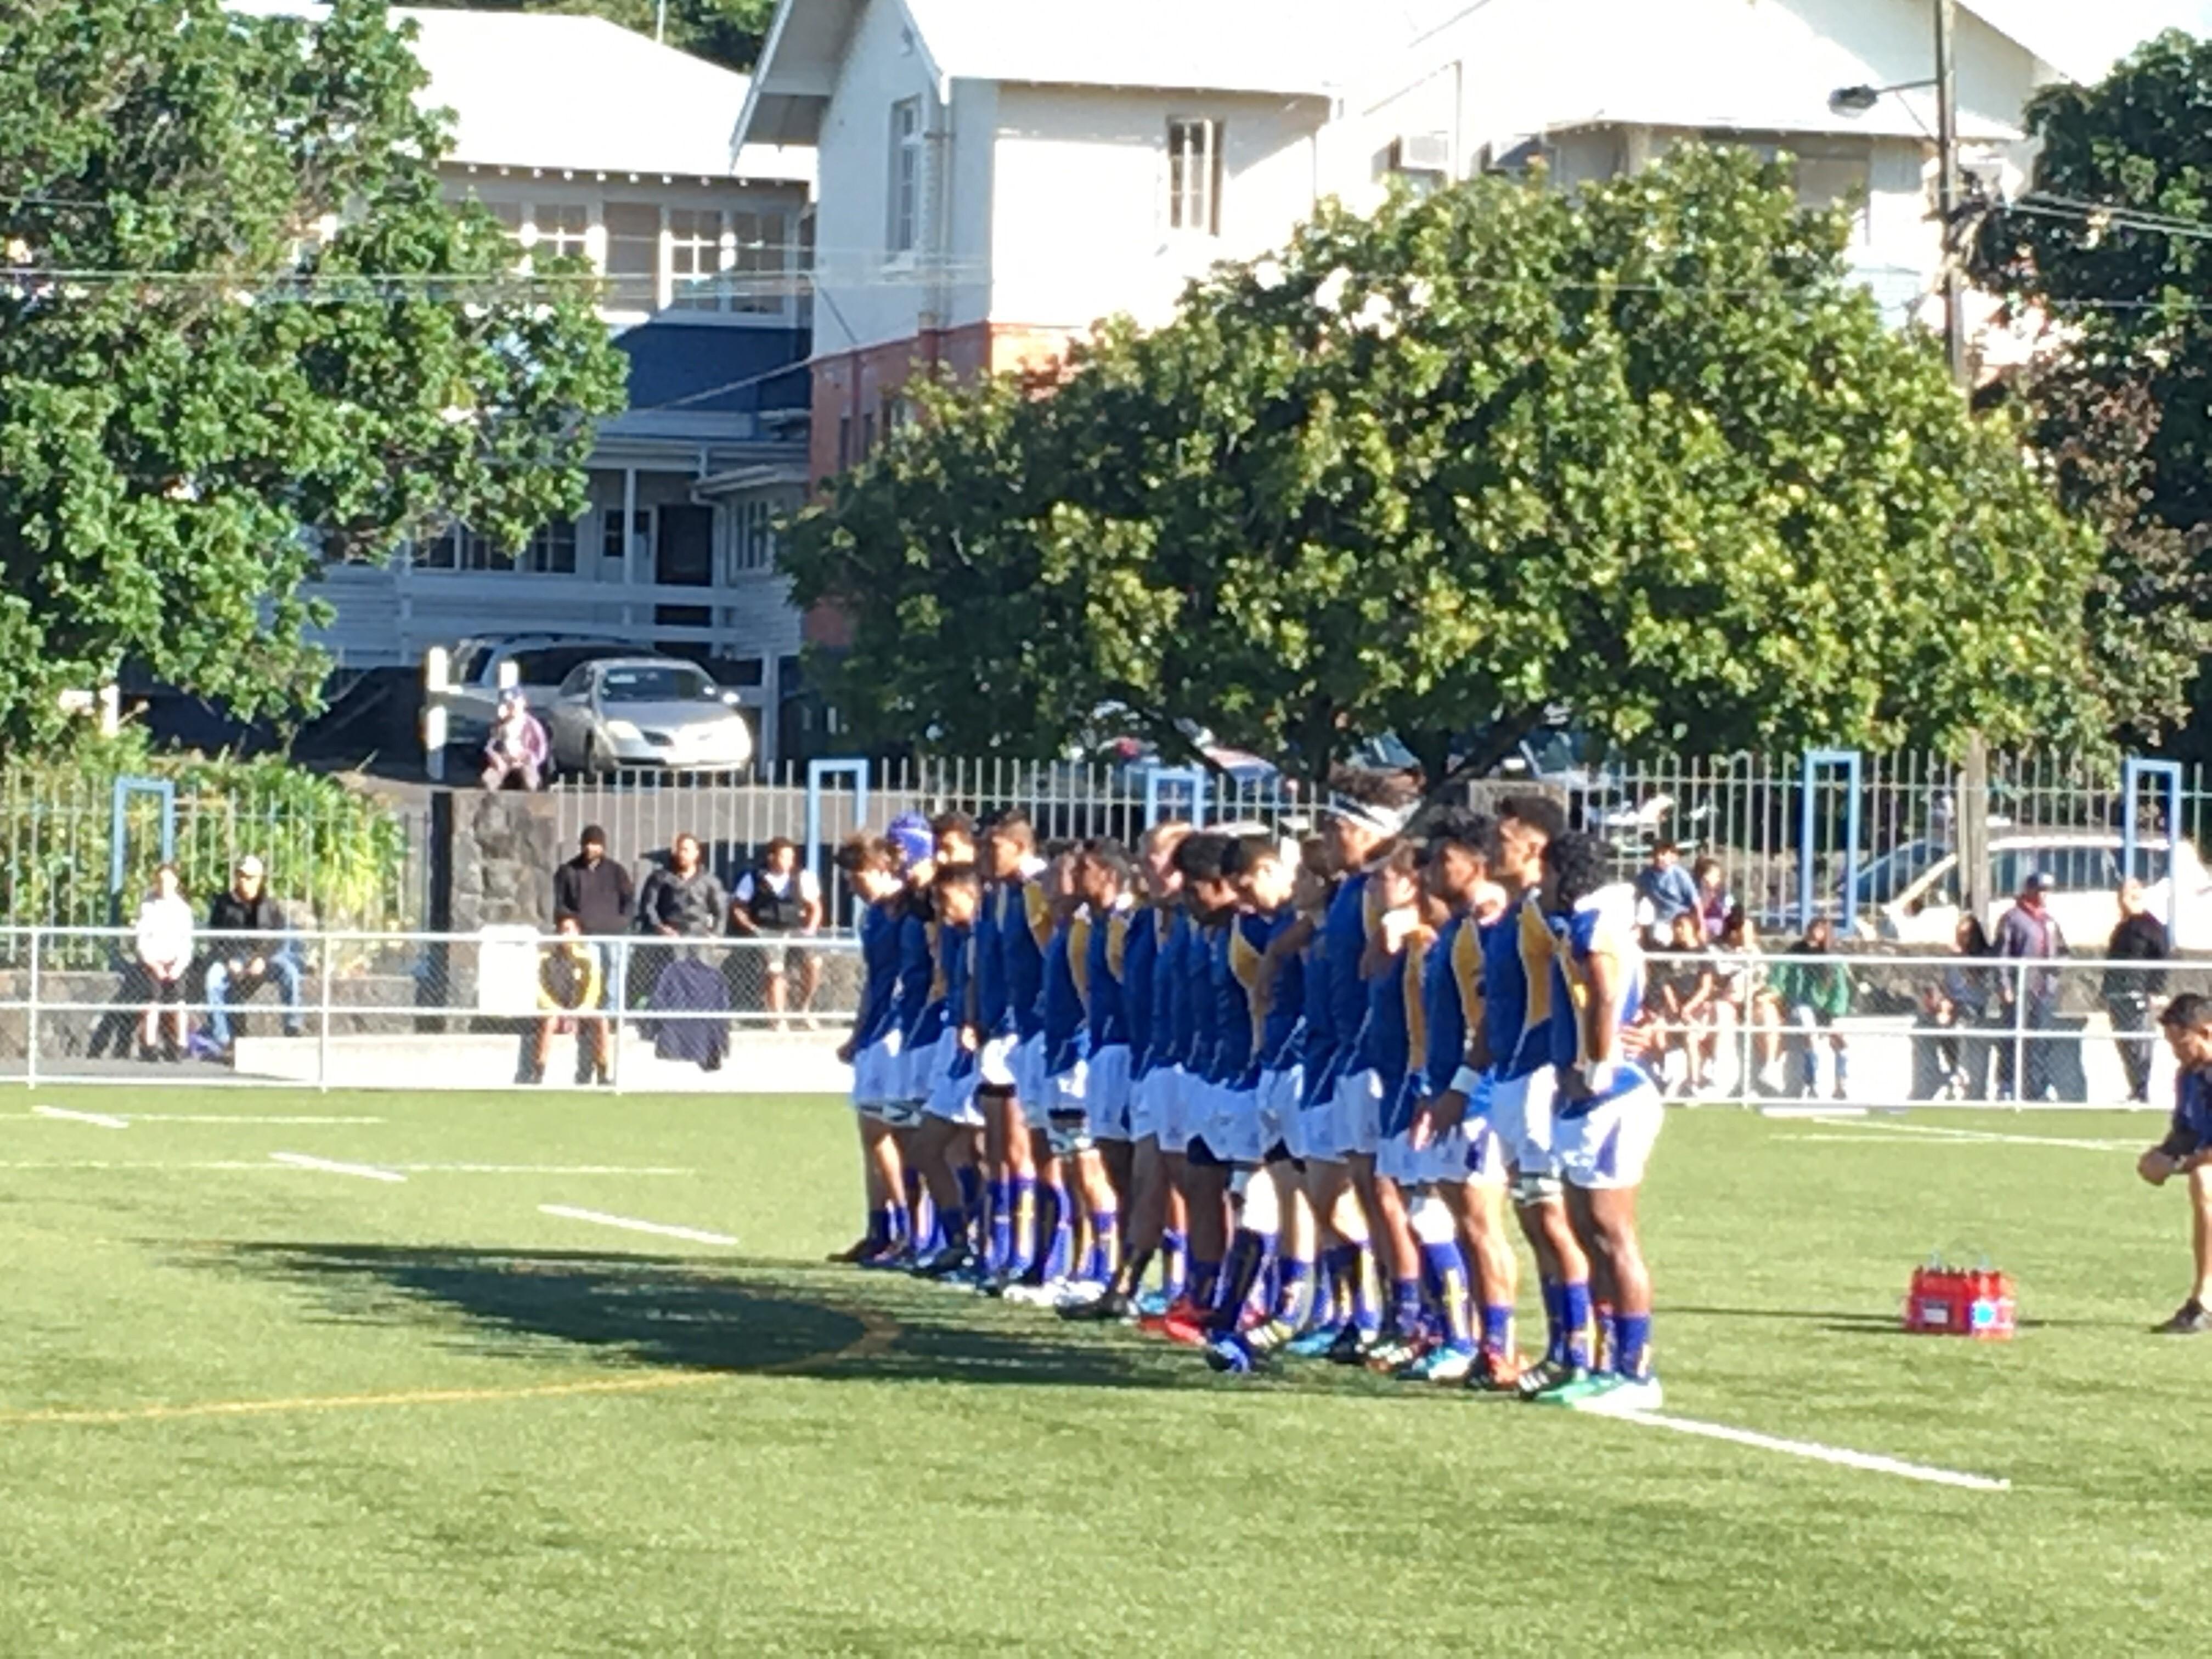 1st XV team